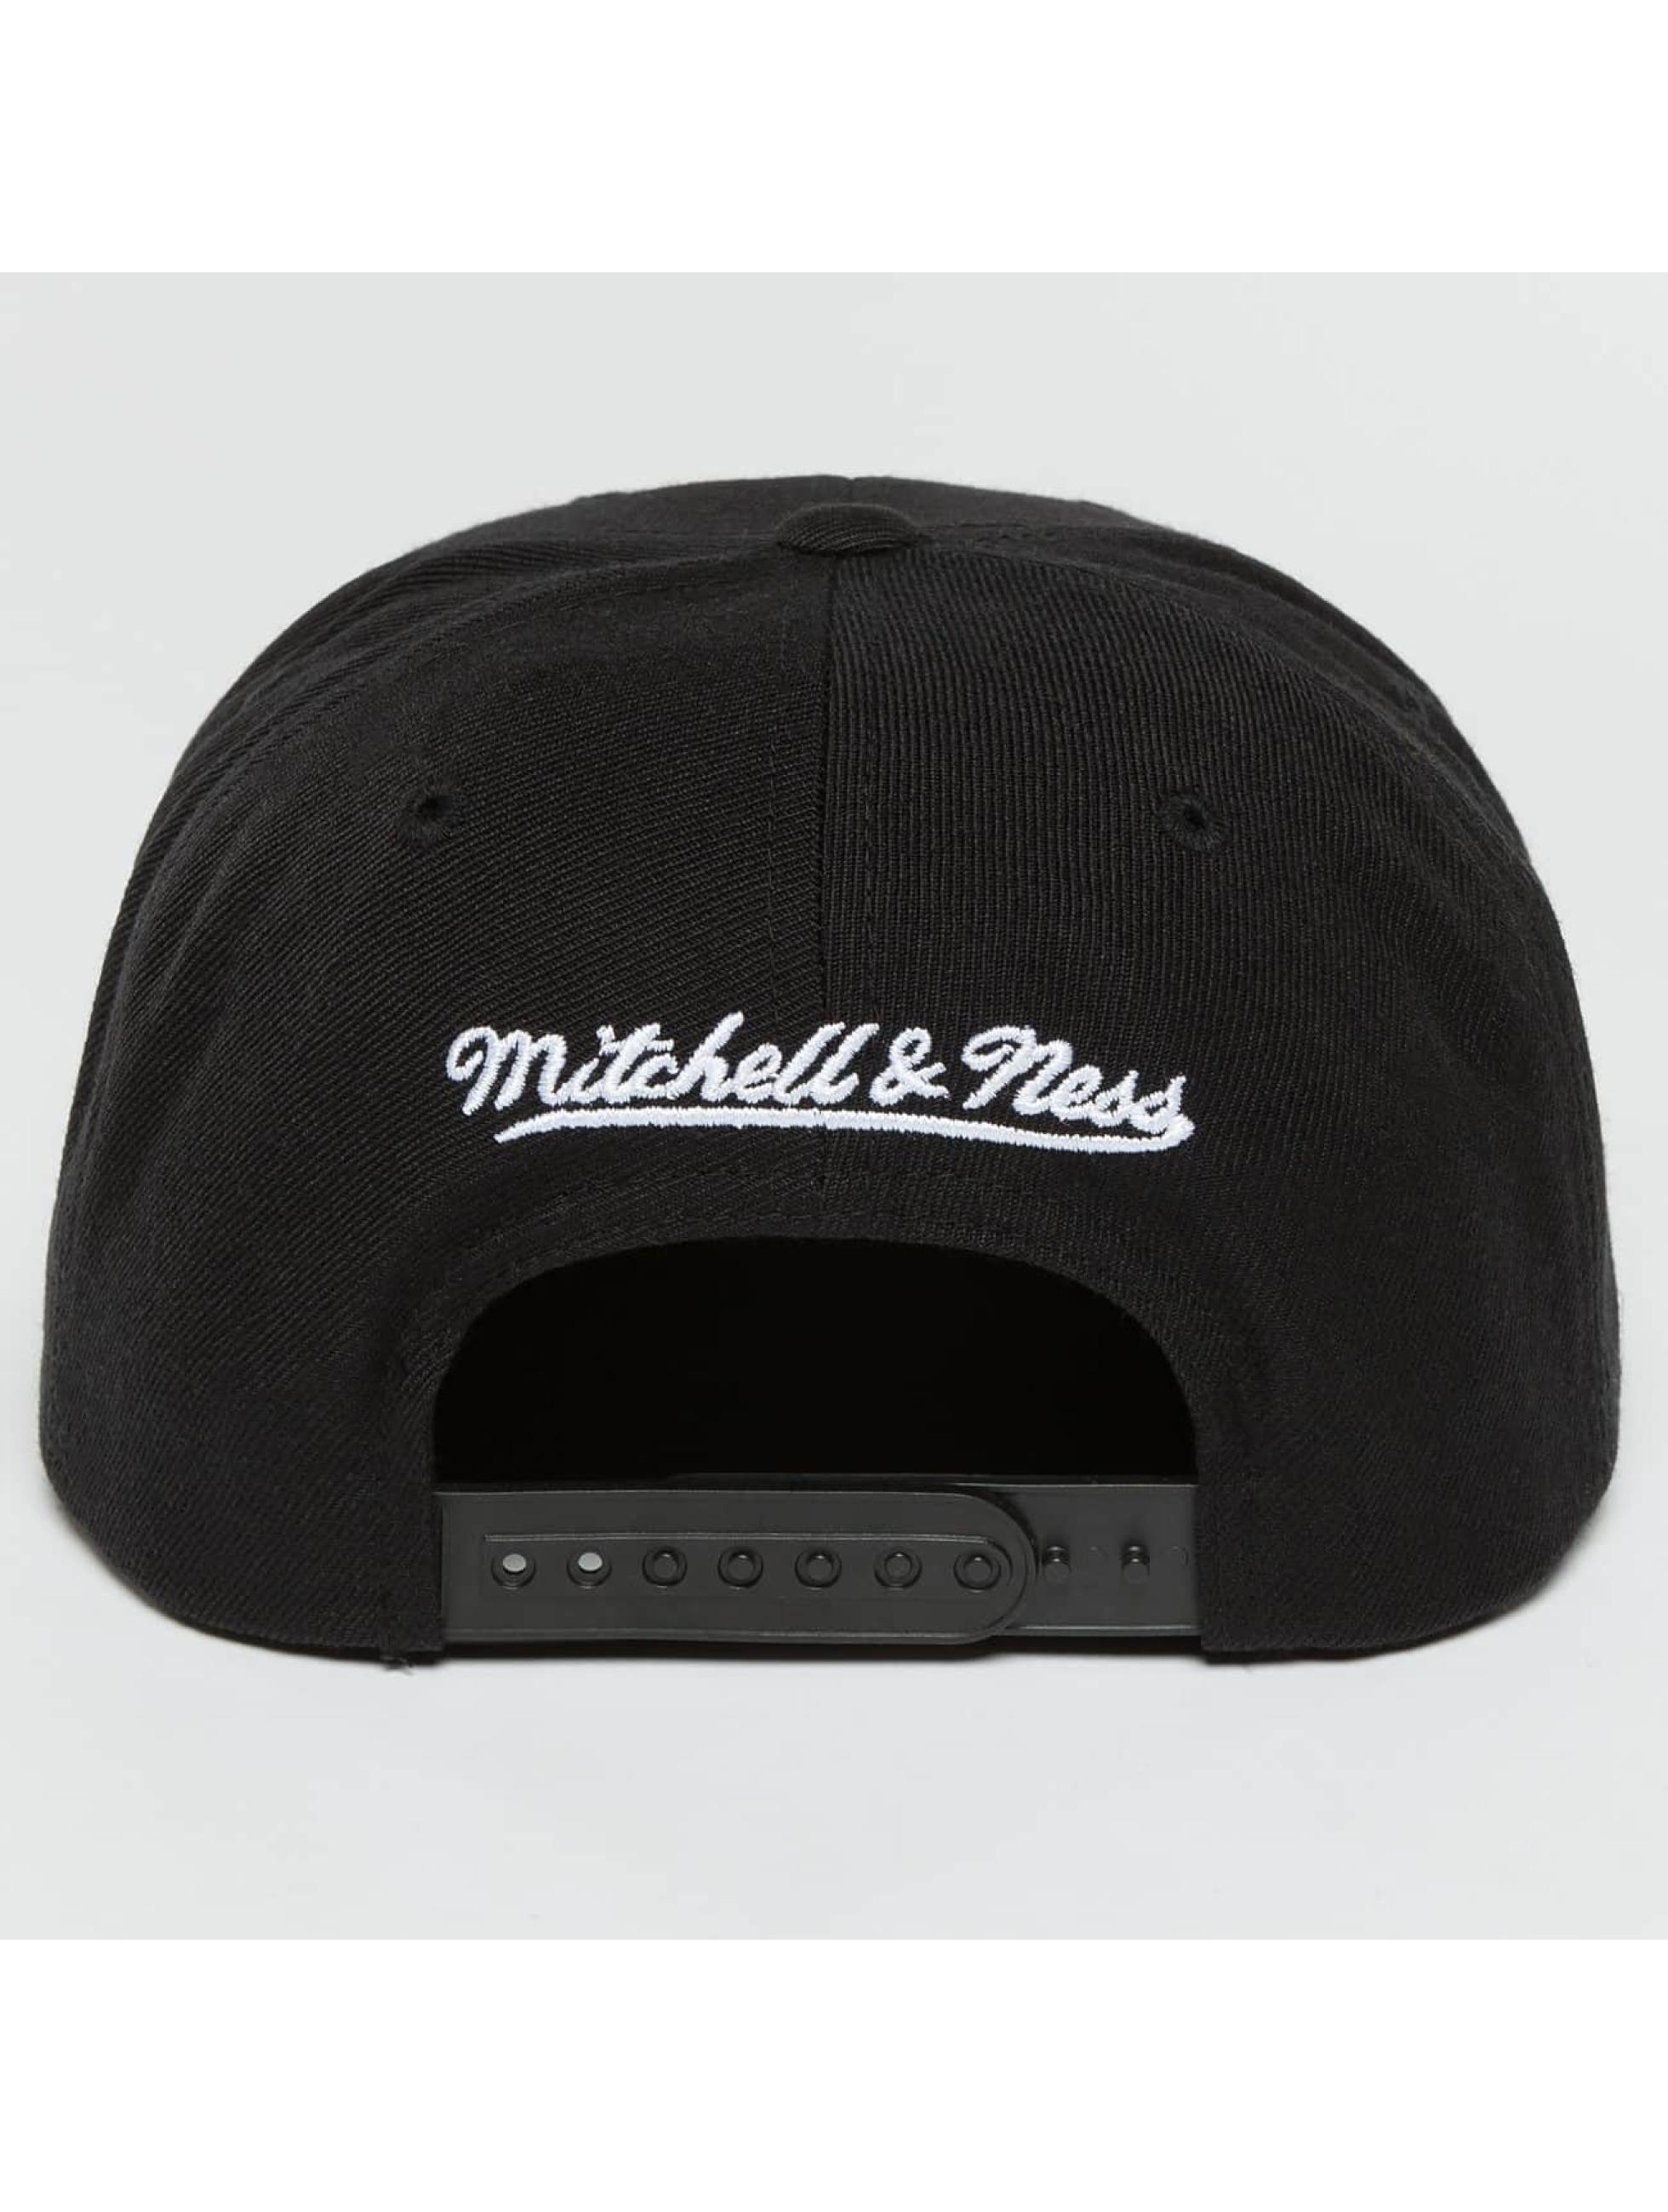 Mitchell & Ness Snapback Caps Full Dollar Own Brand čern